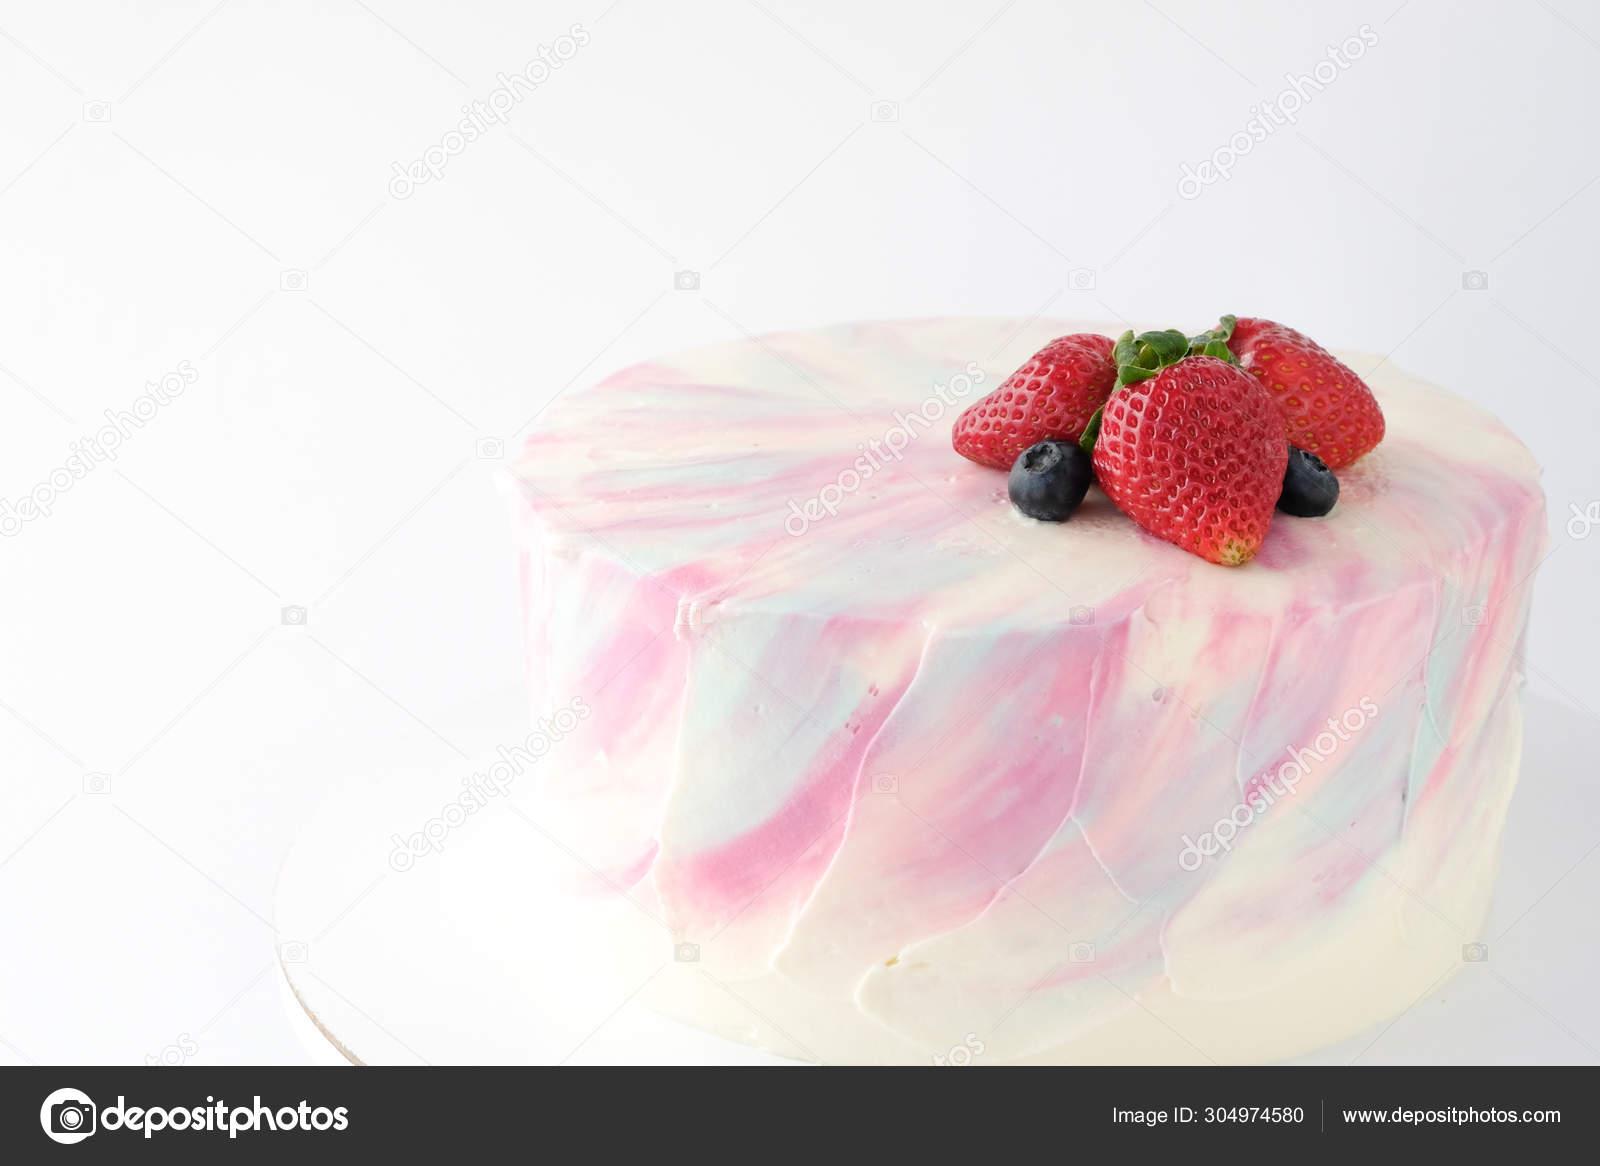 Amazing Birthday Cake Strawberries Blueberries Blackberry White Background Personalised Birthday Cards Petedlily Jamesorg